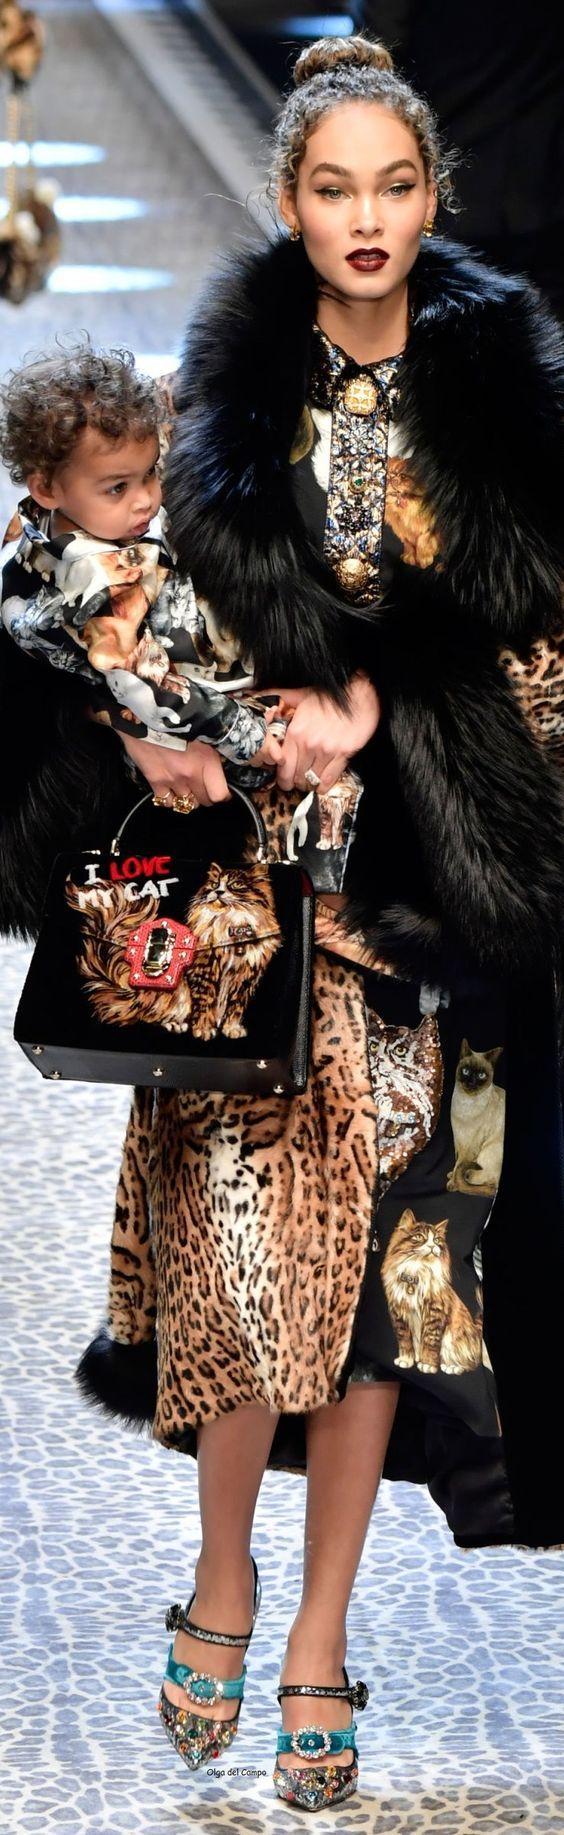 Dolce & Gabbana ~ Fashion Luxury